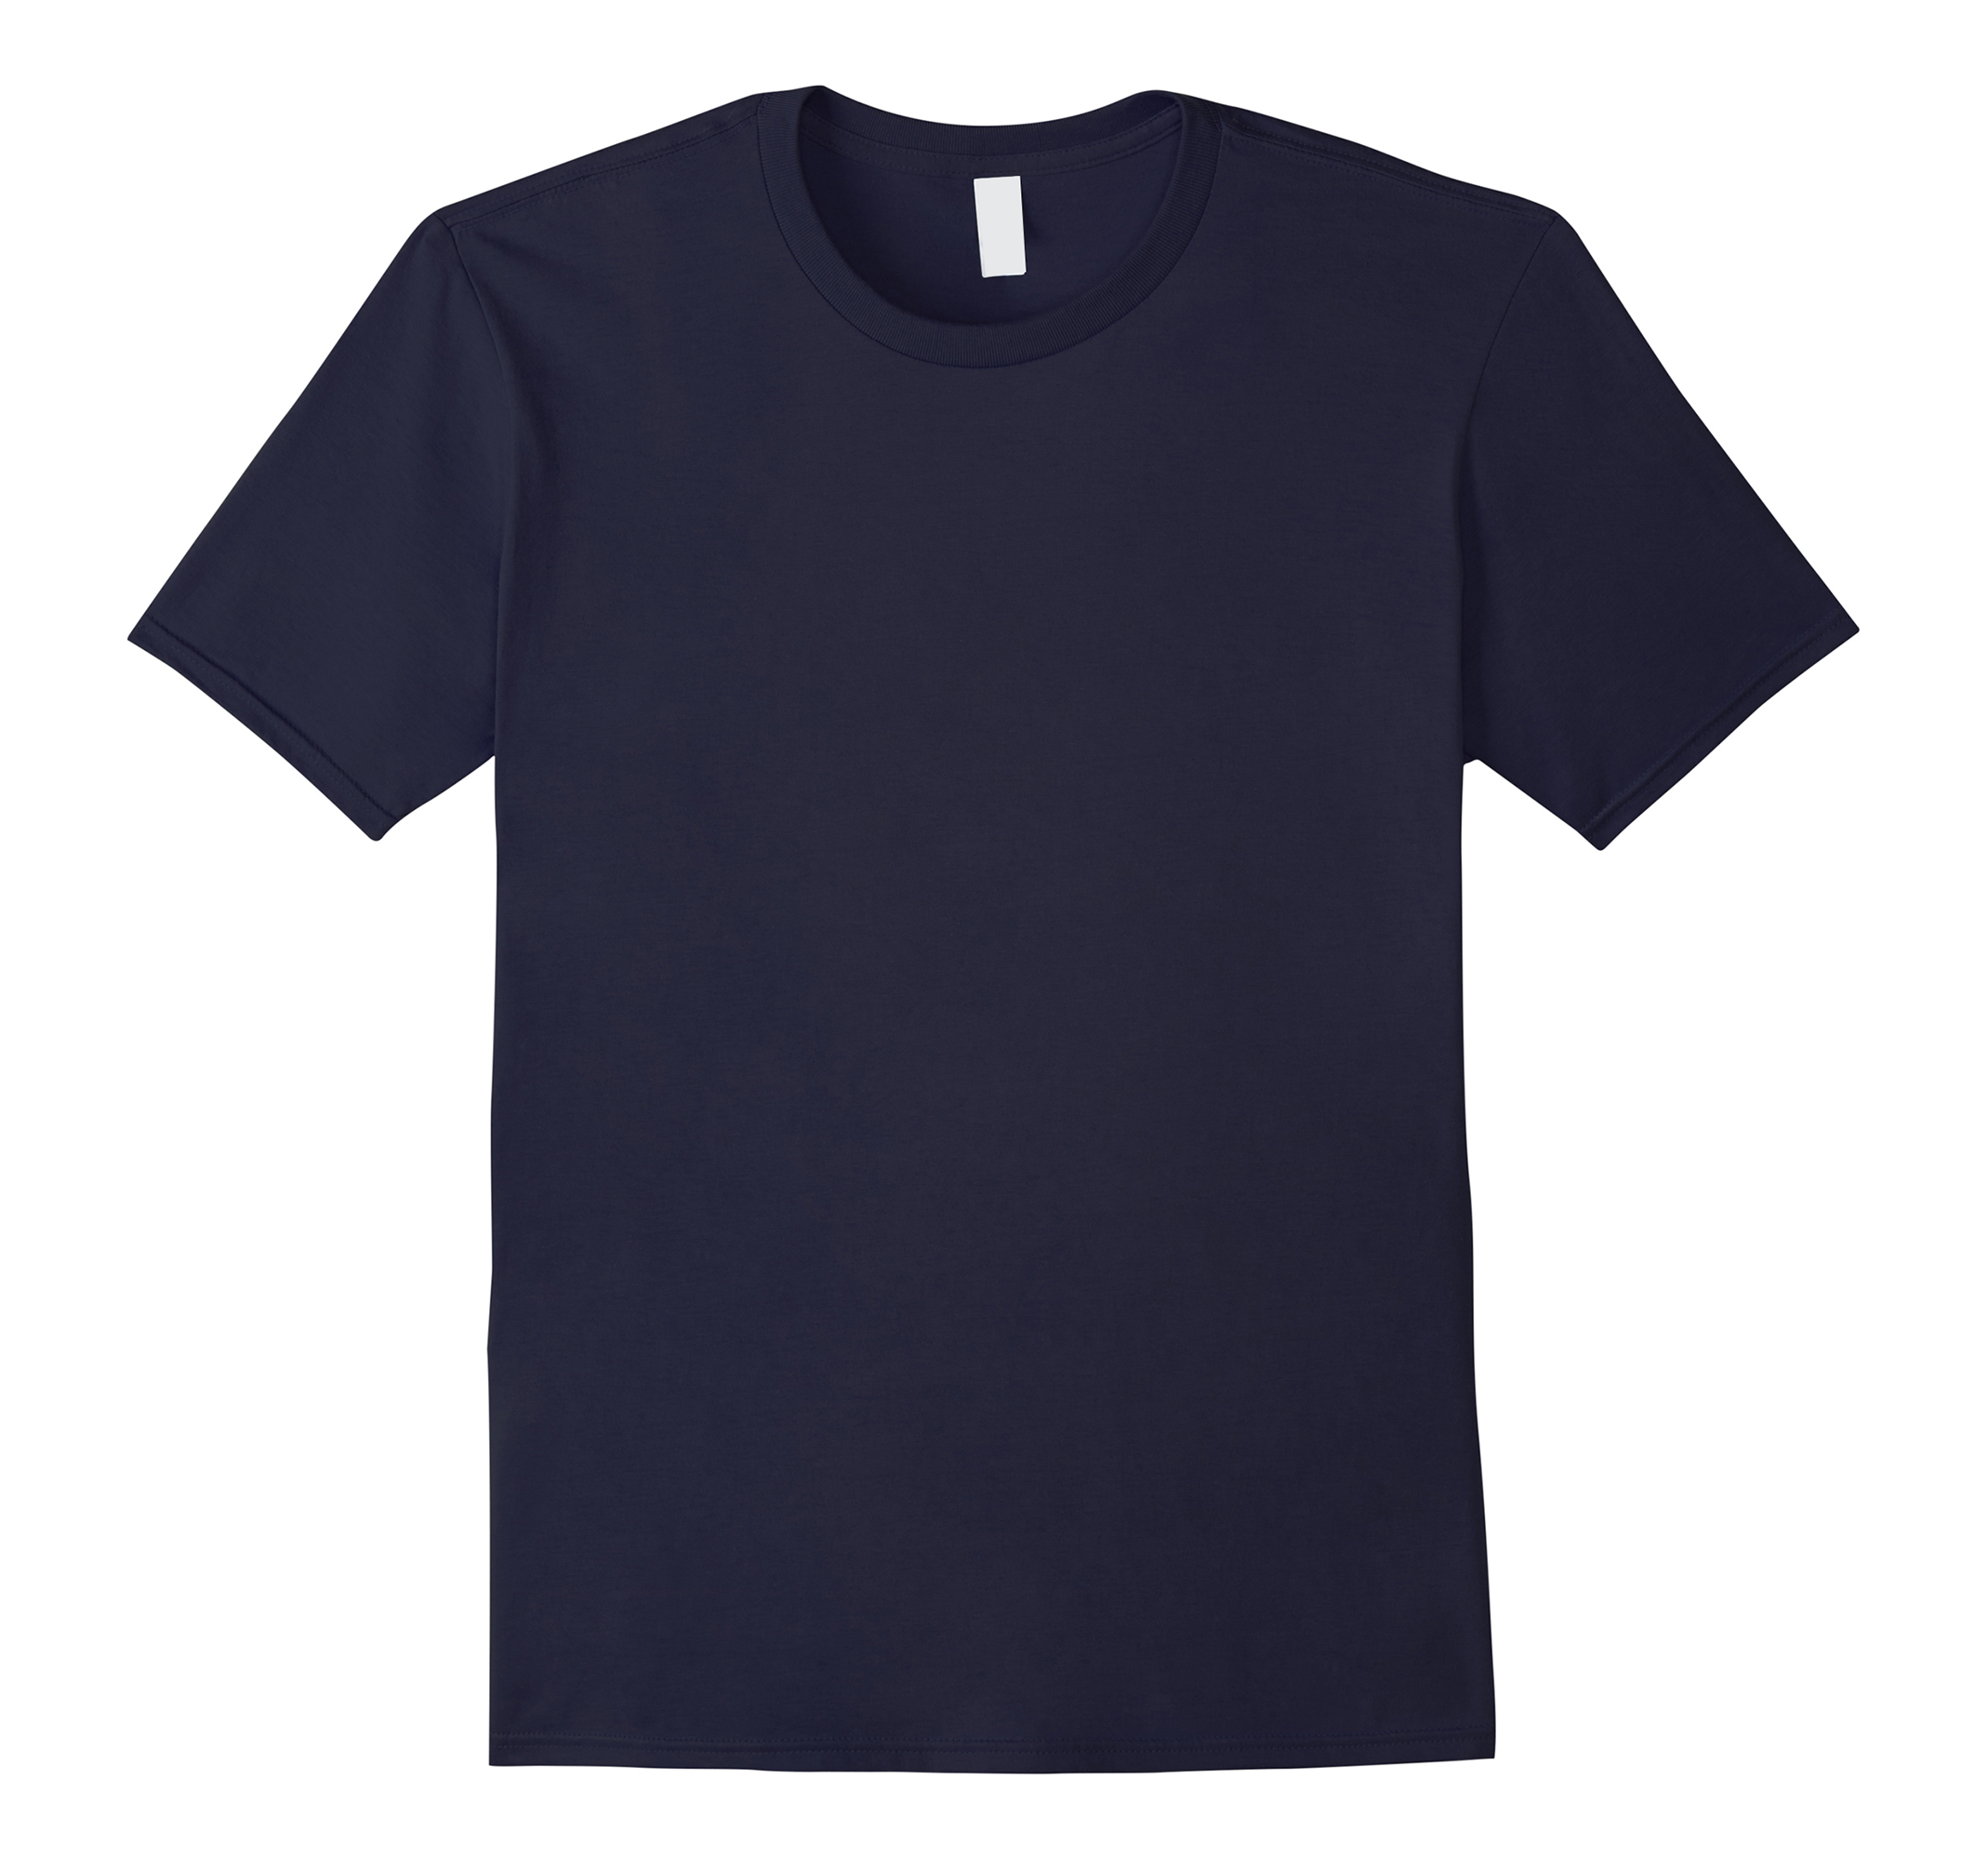 Darwin Loves You Hoody Evolution T-Shirt Funny Science Teacher Gift Hoodie Great